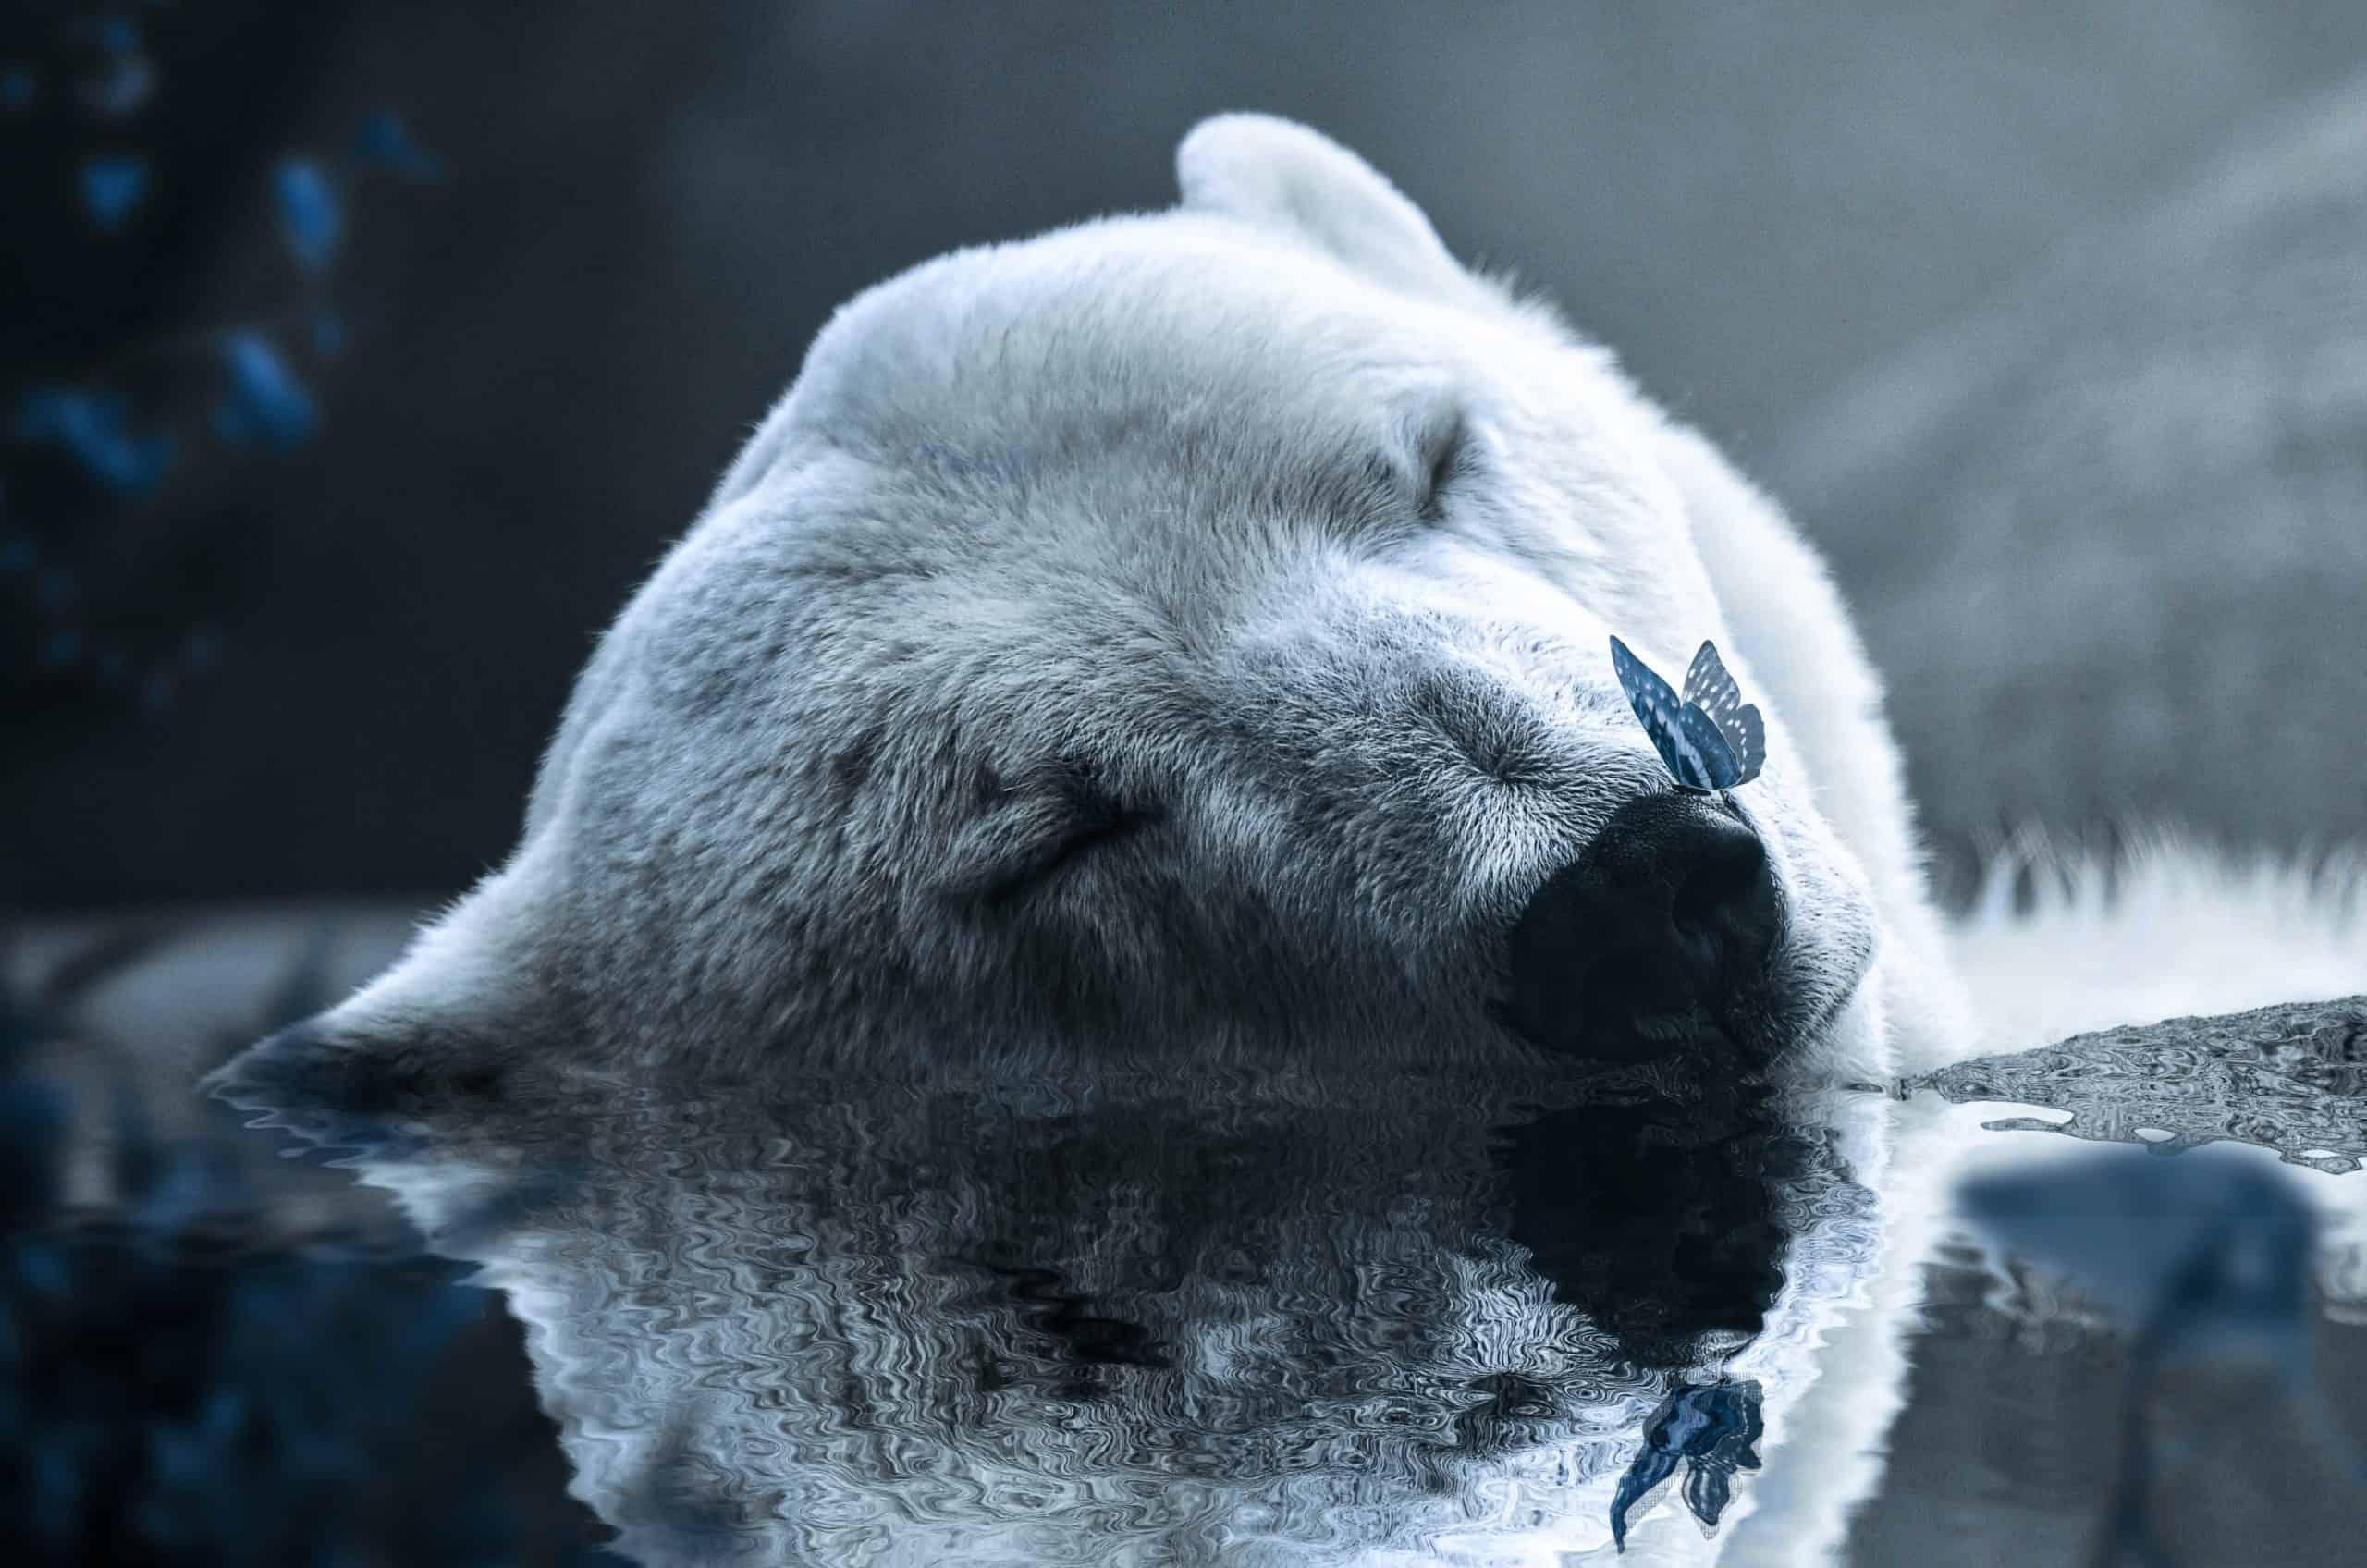 Create a Photo Manipulation of a Polar Bear